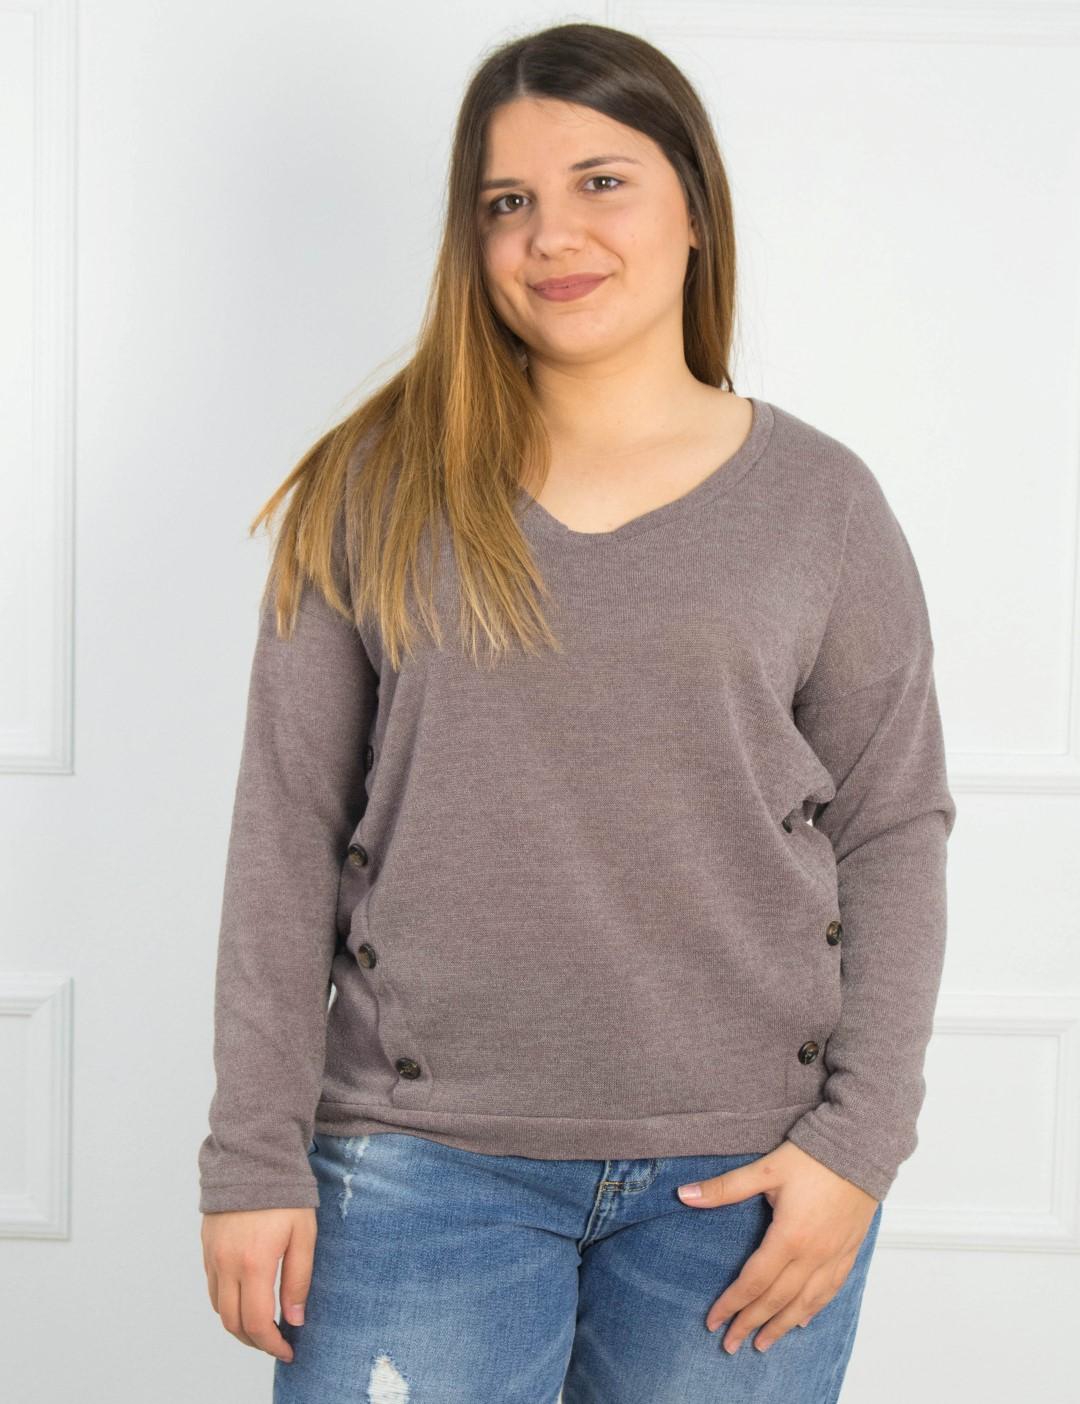 6bbc64ae2a09 Γυναικεία μπεζ μακρυμάνικη μπλούζα κουμπιά Honey 39530Z